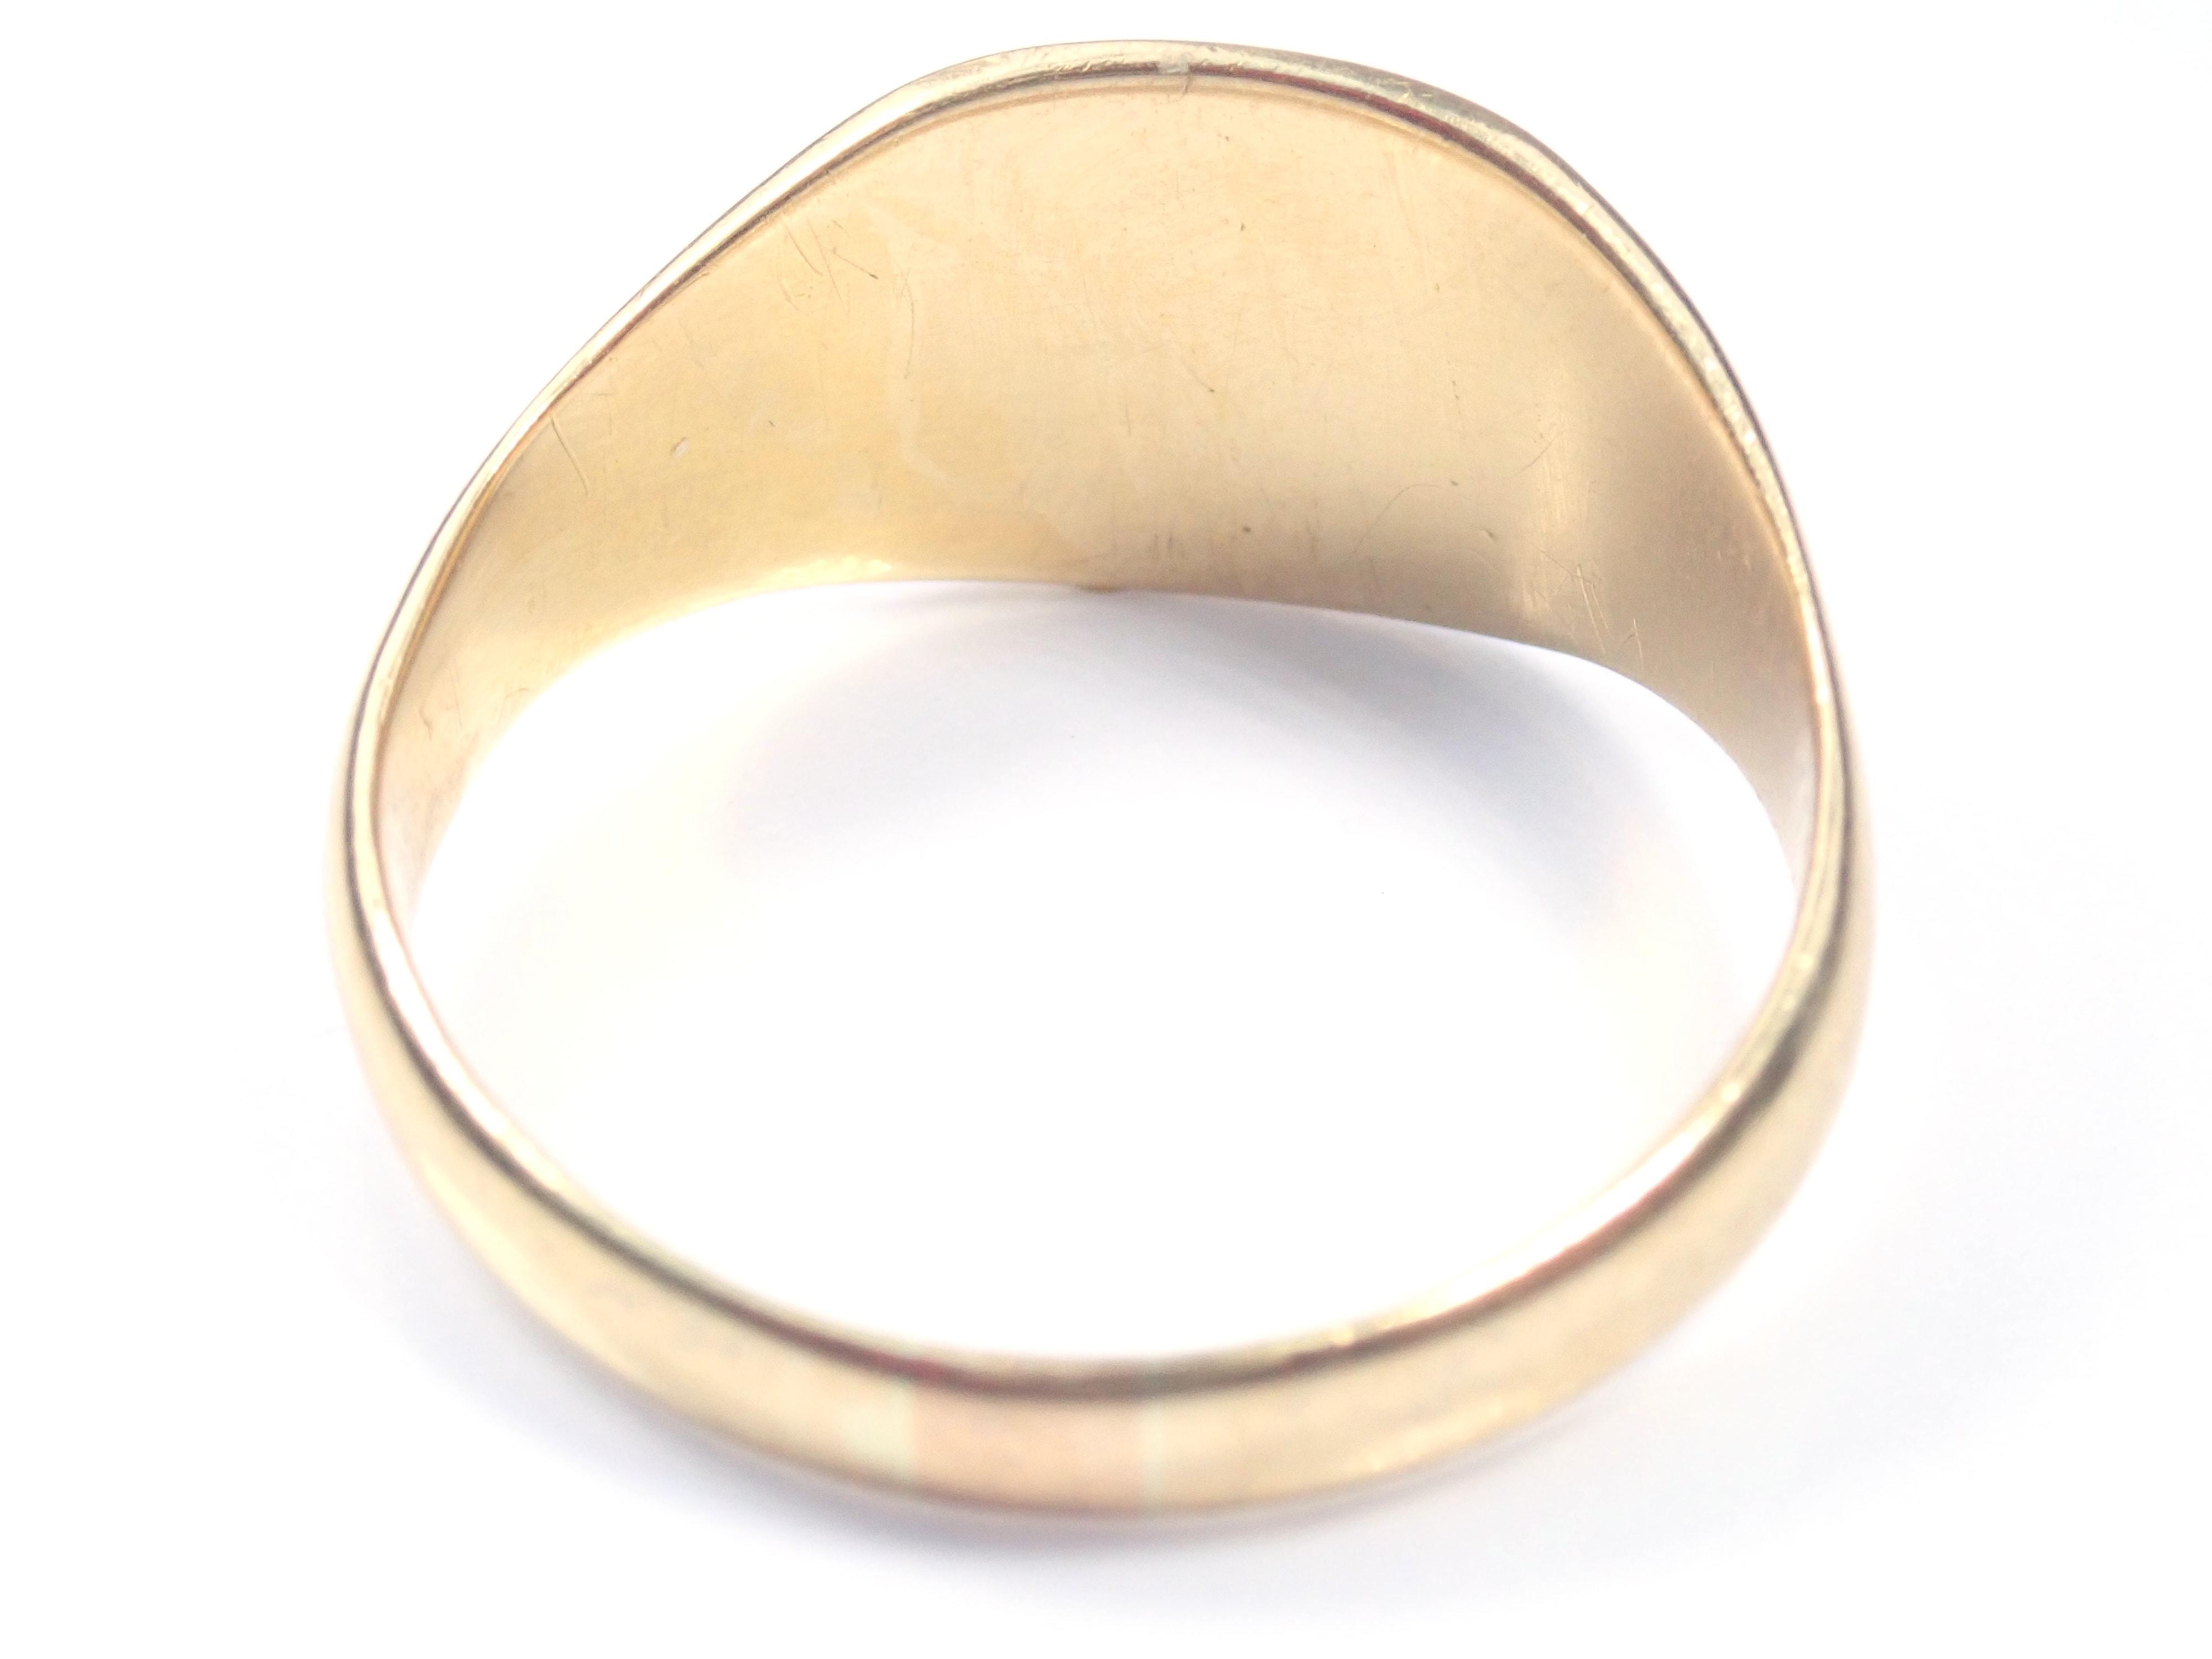 AZZ00875 1 - Beautiful!! Vintage Shield Solid 18 carat Gold Signet Ring - Size V - 6.95gms #150